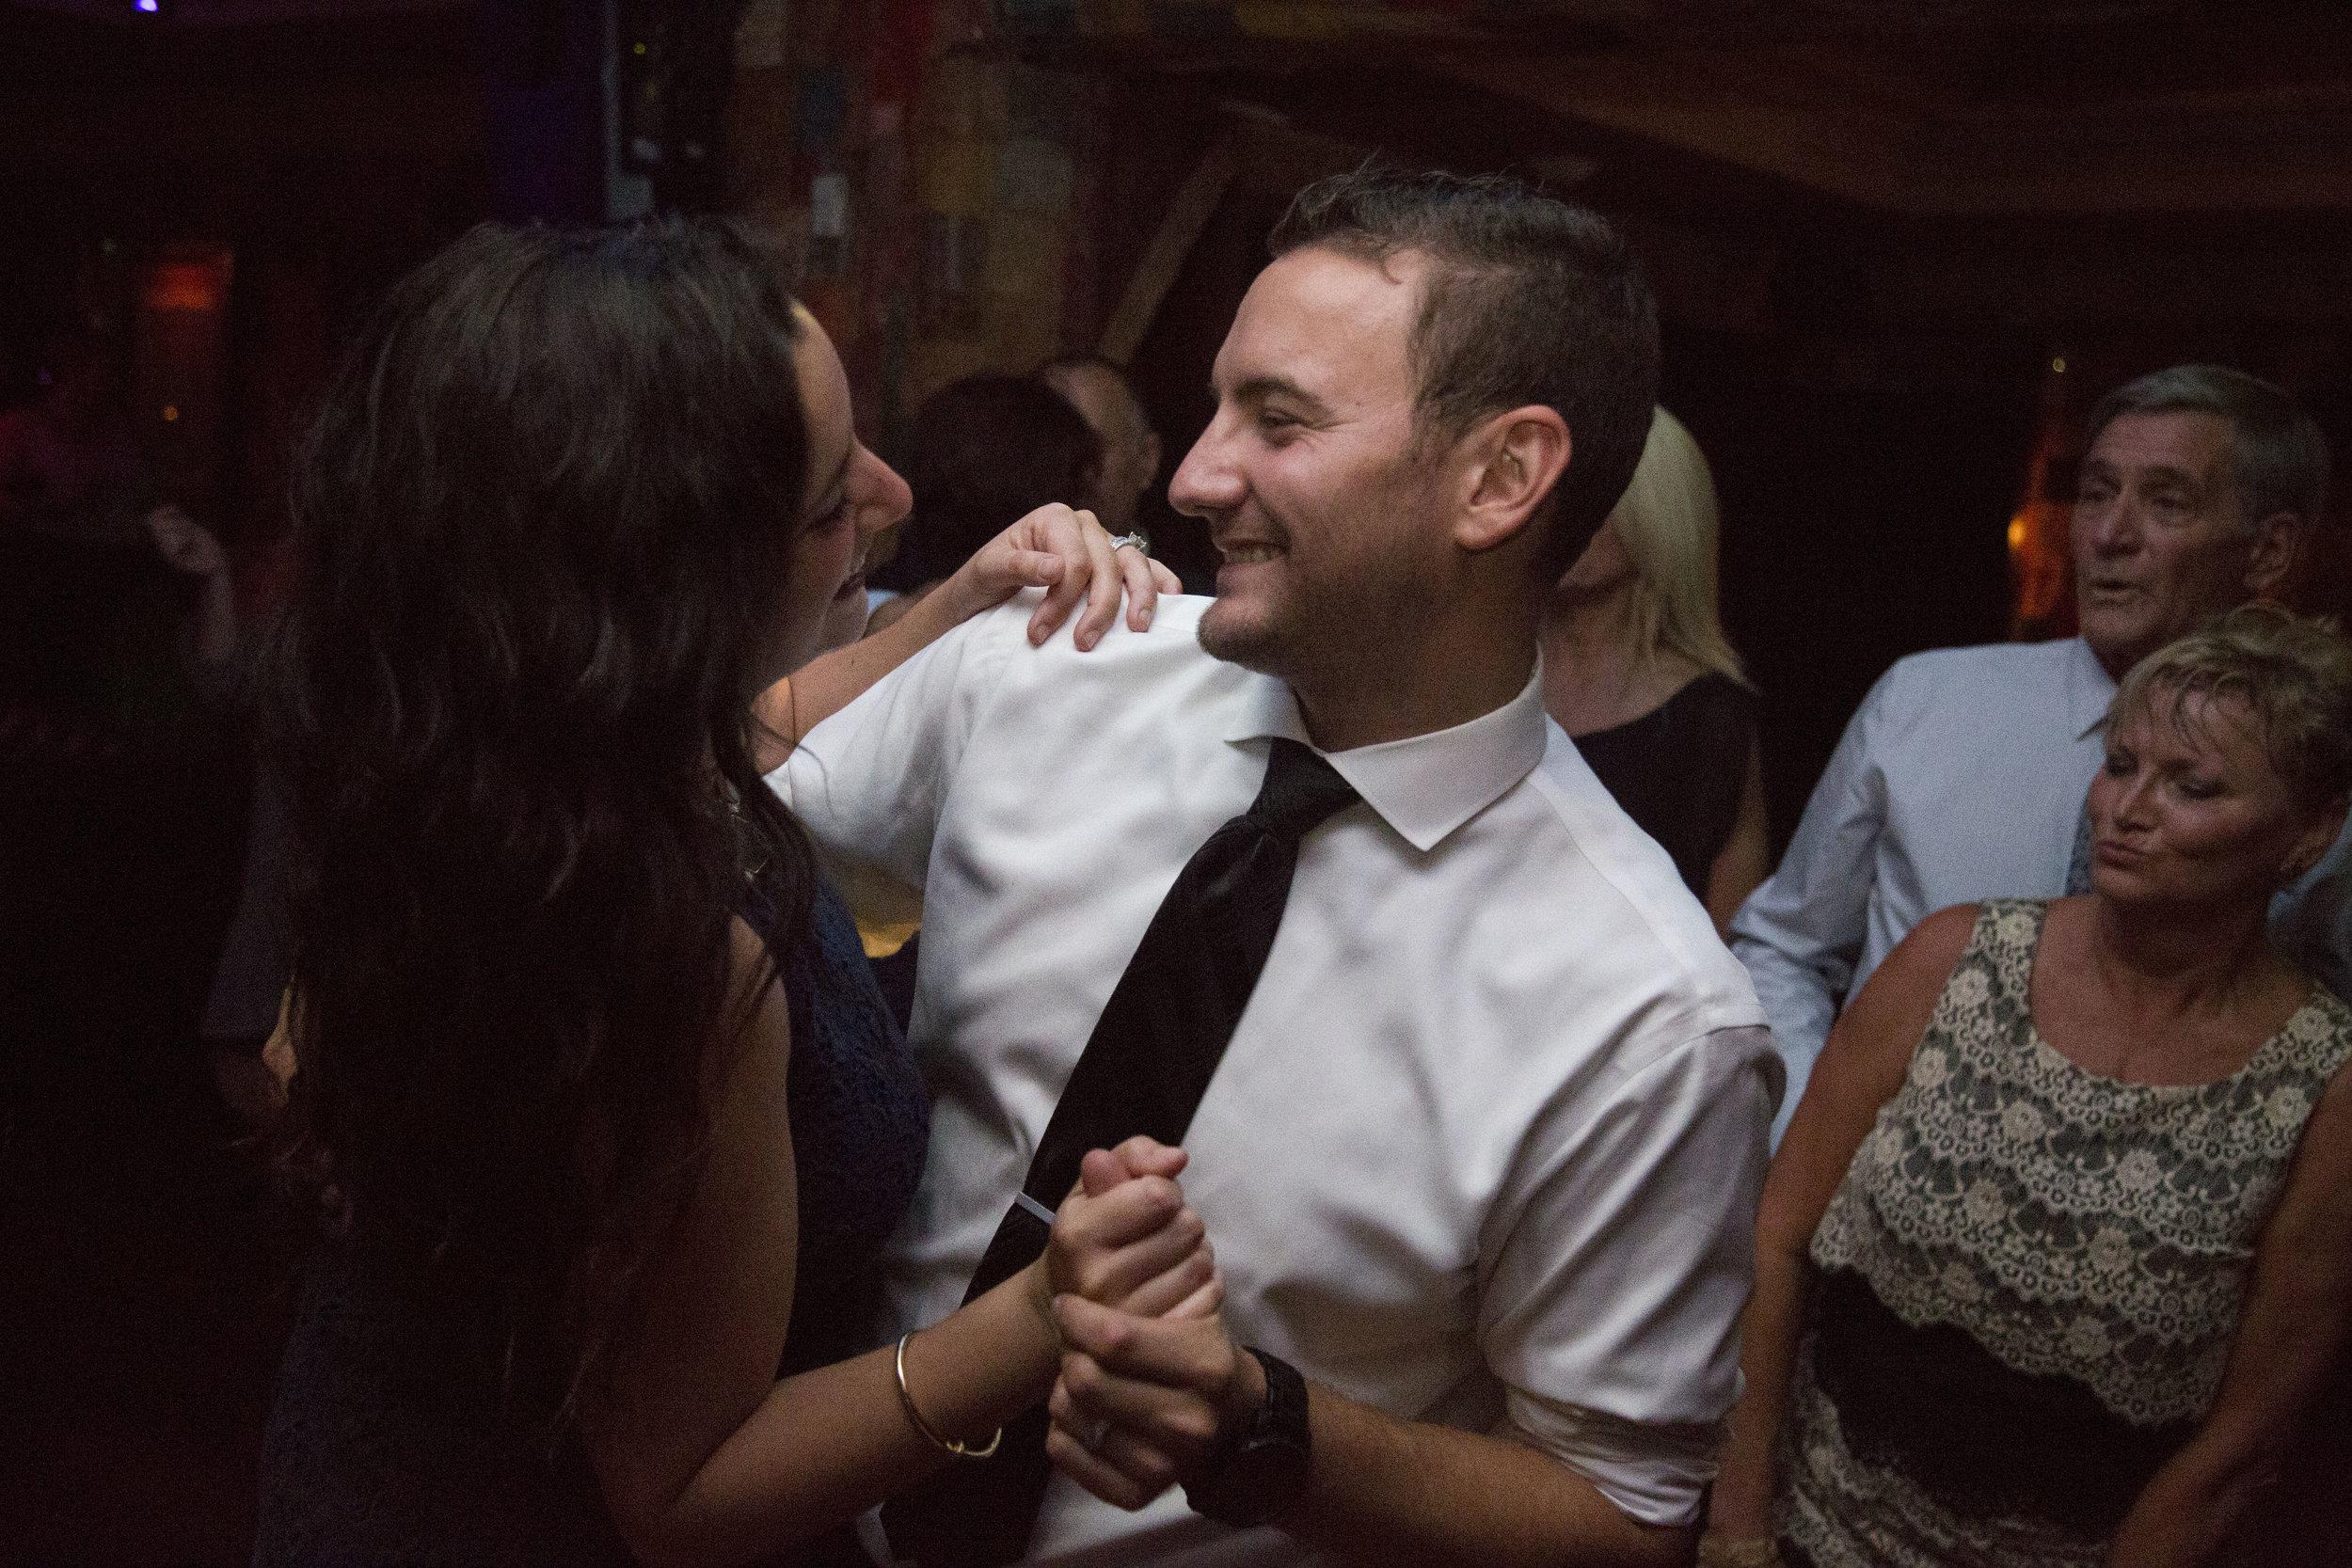 ATGI_Kat and Gabe Wedding 2016_2S8A6264.jpg